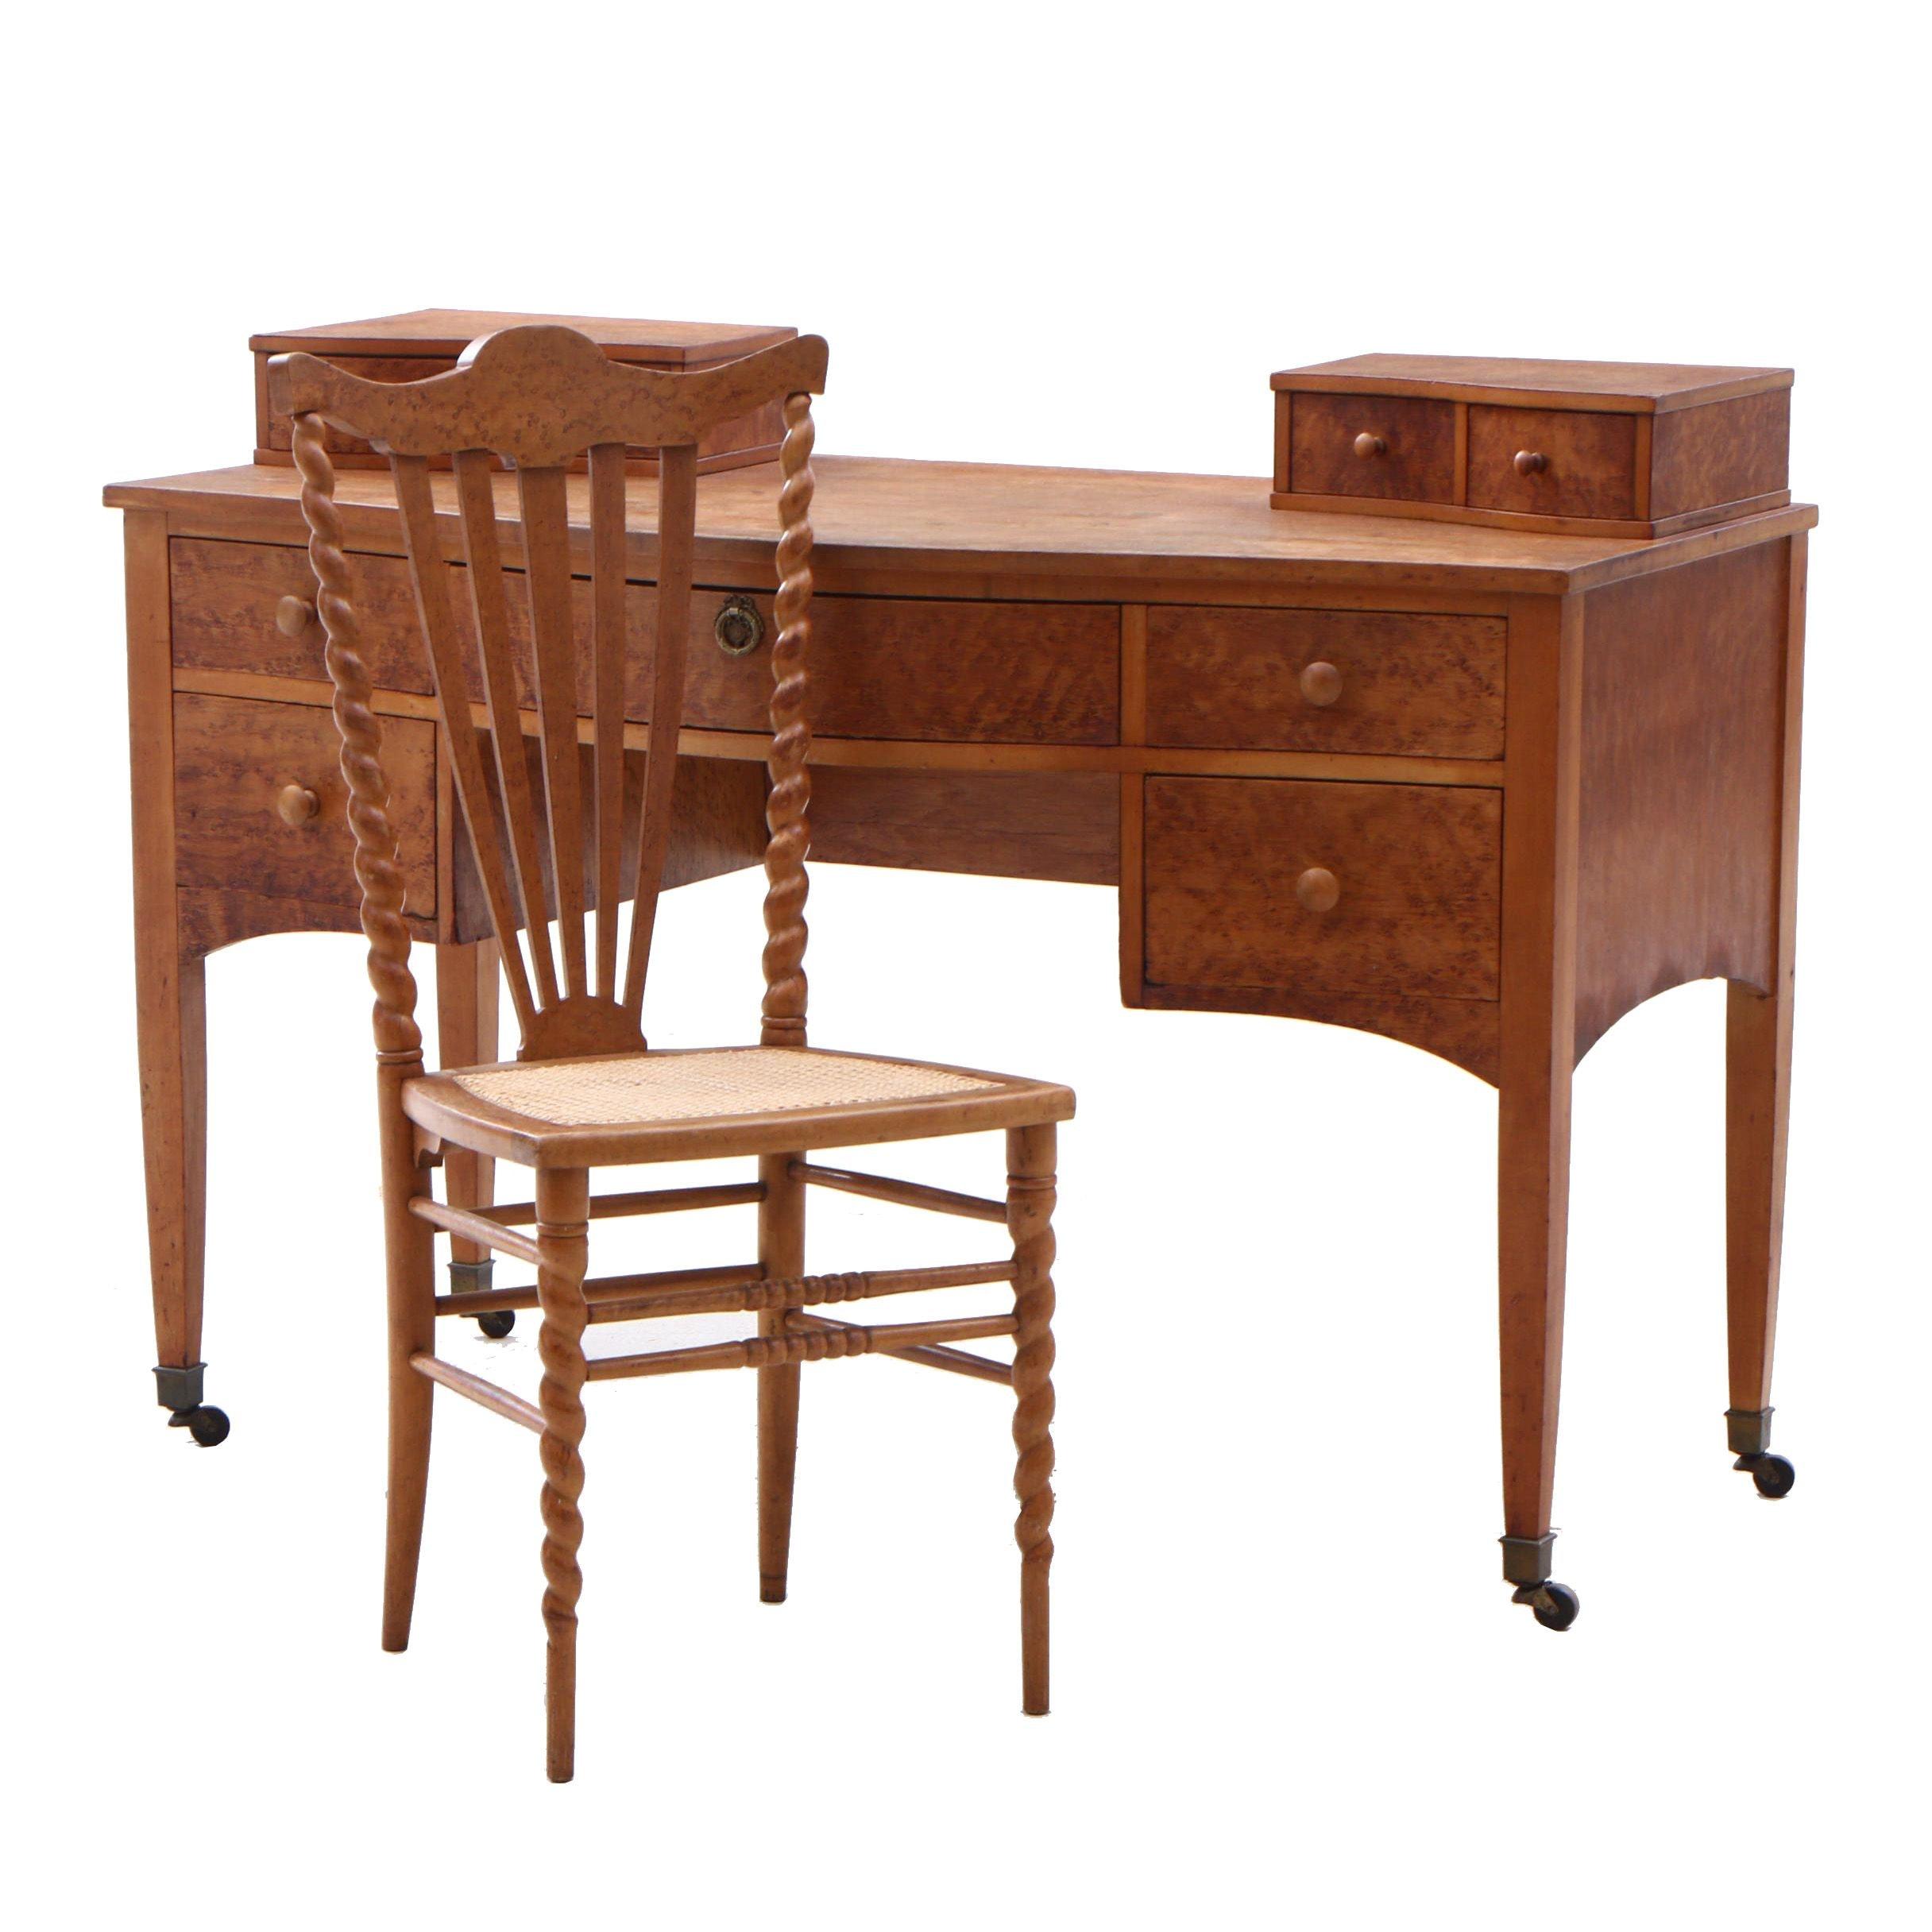 Late Victorian Birdseye Maple Writing Desk, Late 19th Century